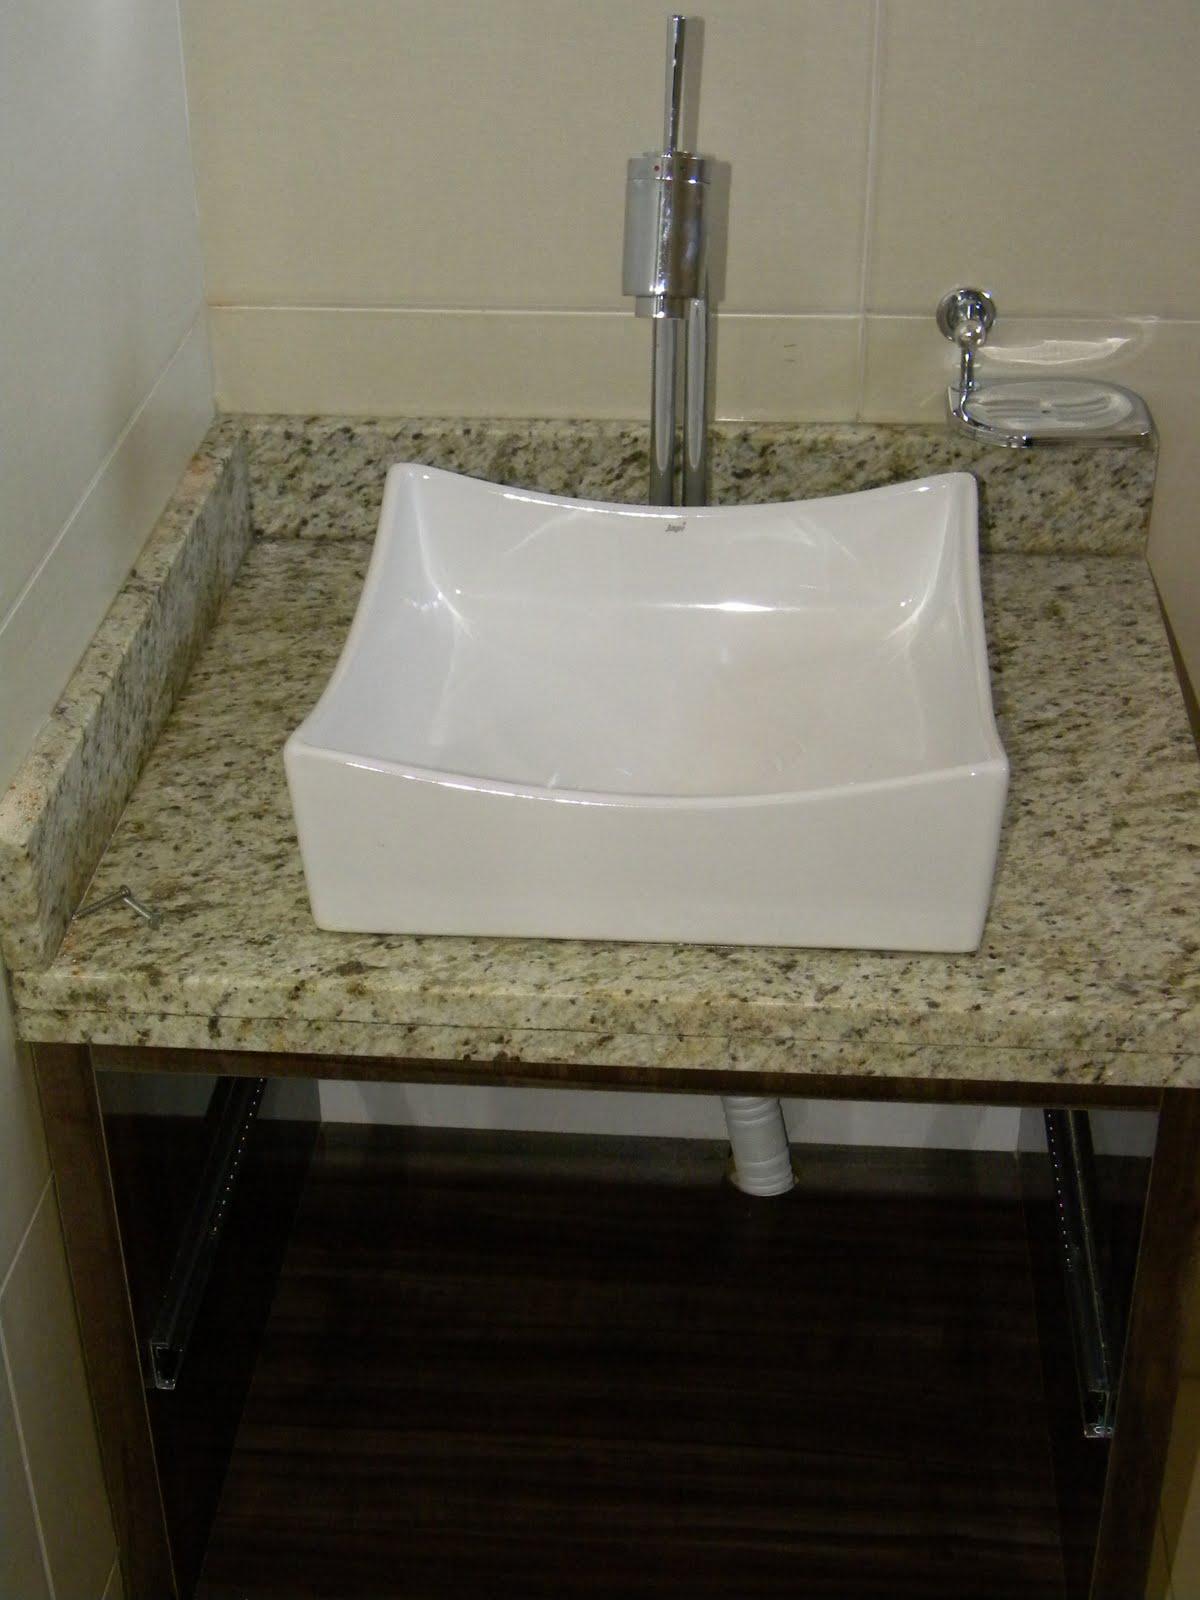 2011 07 31 Marmoraria MPK #18130B 1200x1600 Banheiro Com Granito Ornamental